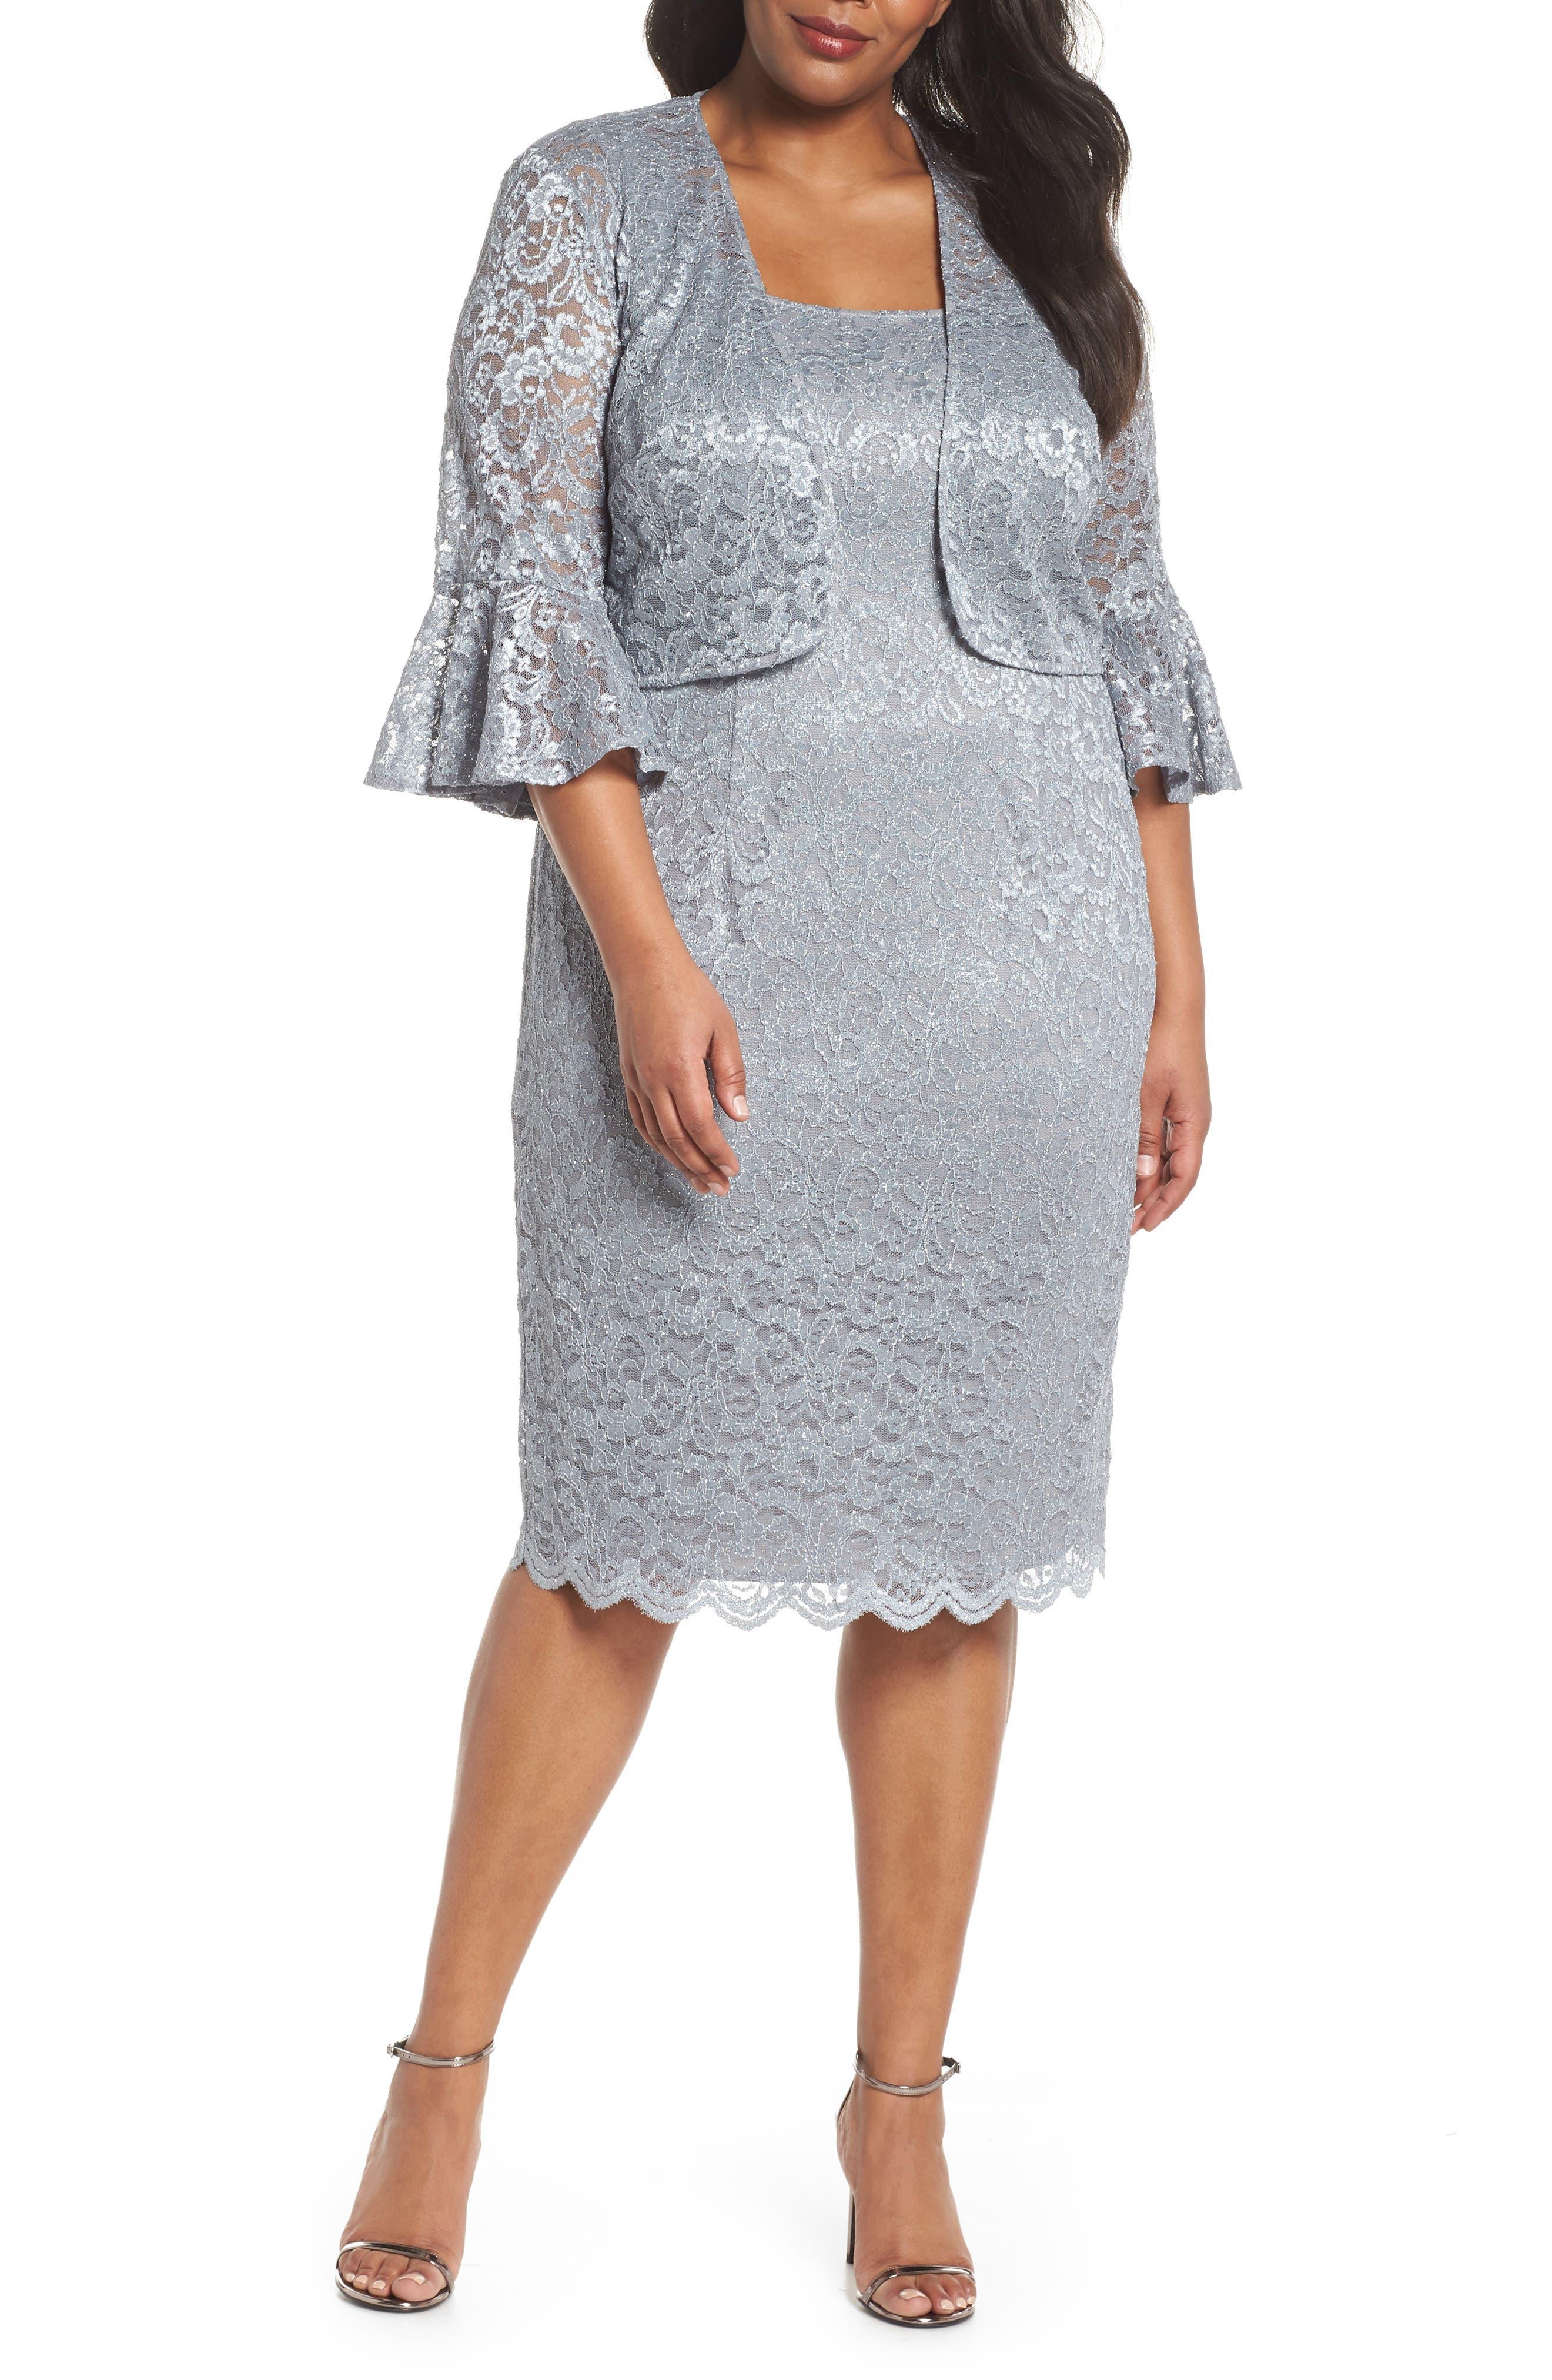 Lace Sheath Dress with Bolero Jacket,                             Main thumbnail 1, color,                             Silver